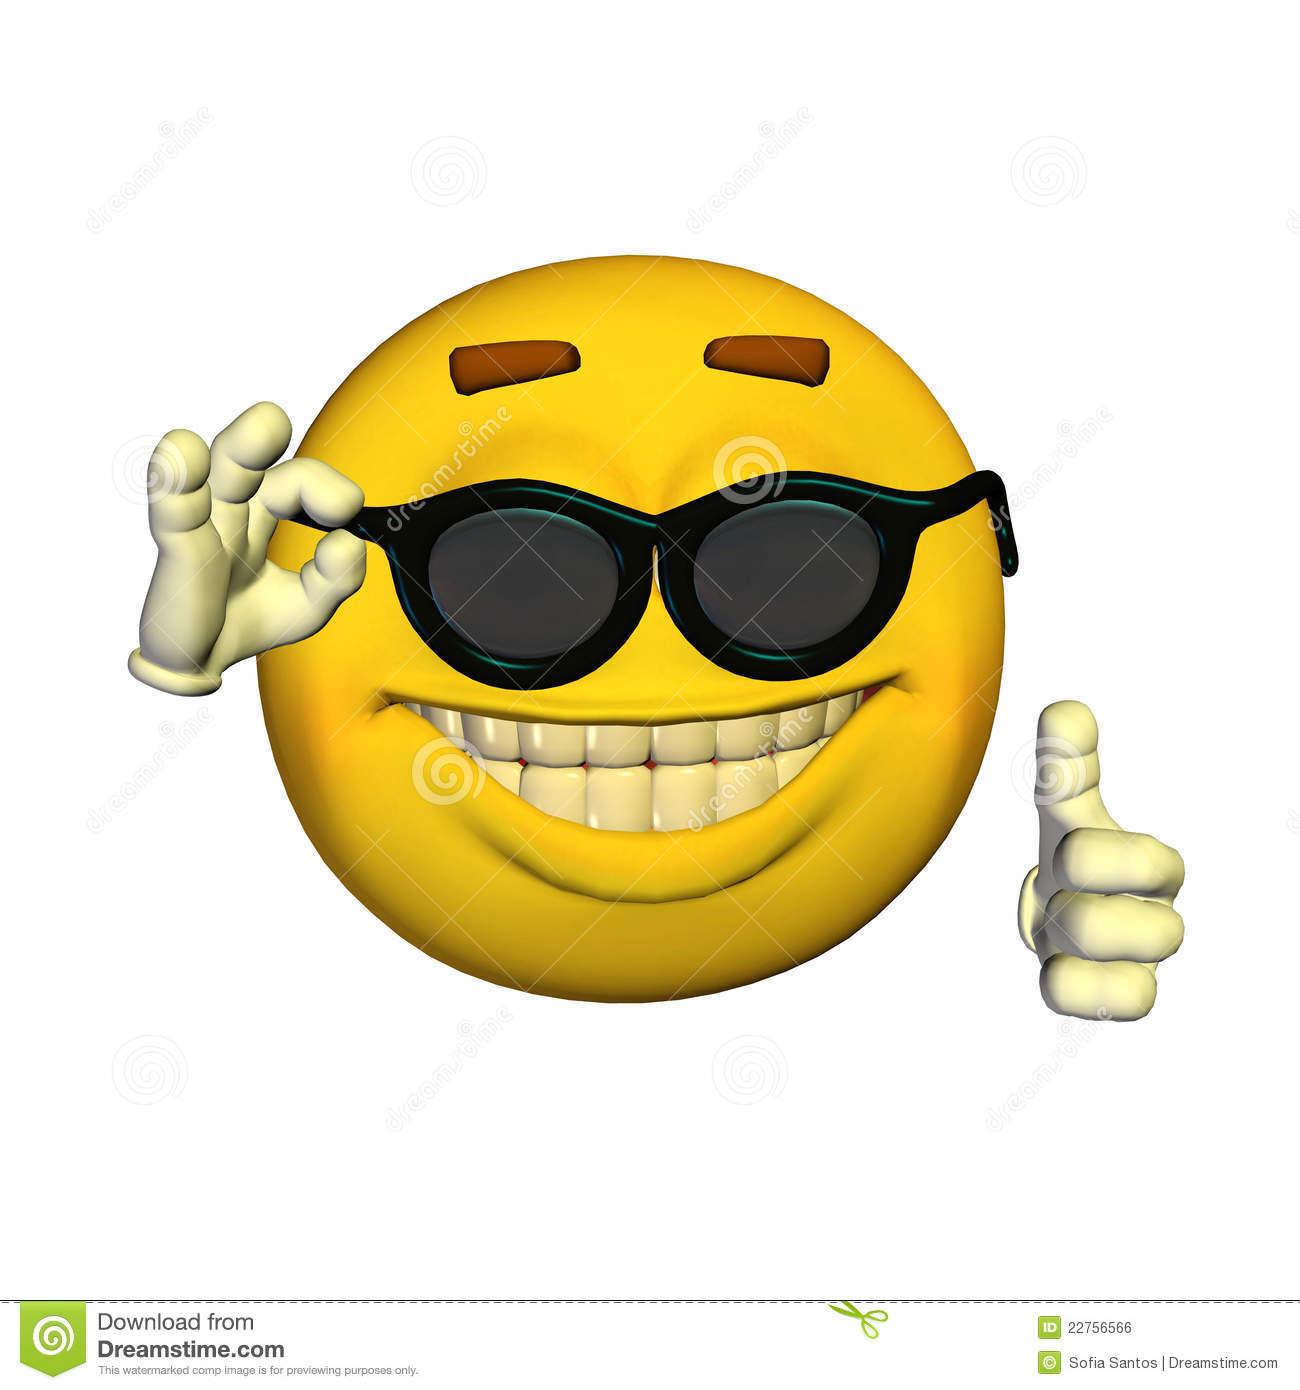 Emoticon - Sunglasses stock illustration. Illustration of expression -  22756566